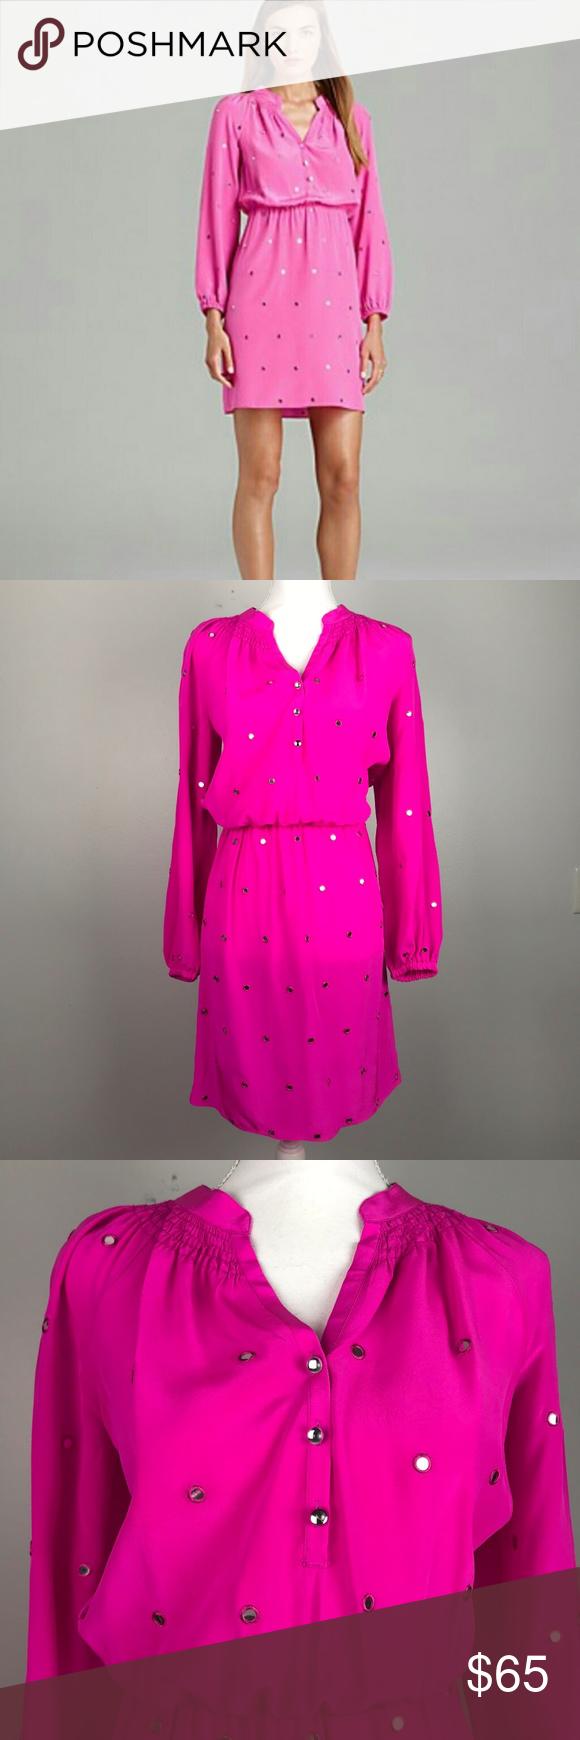 Lilly pulitzer xs turner hot pink dot dress